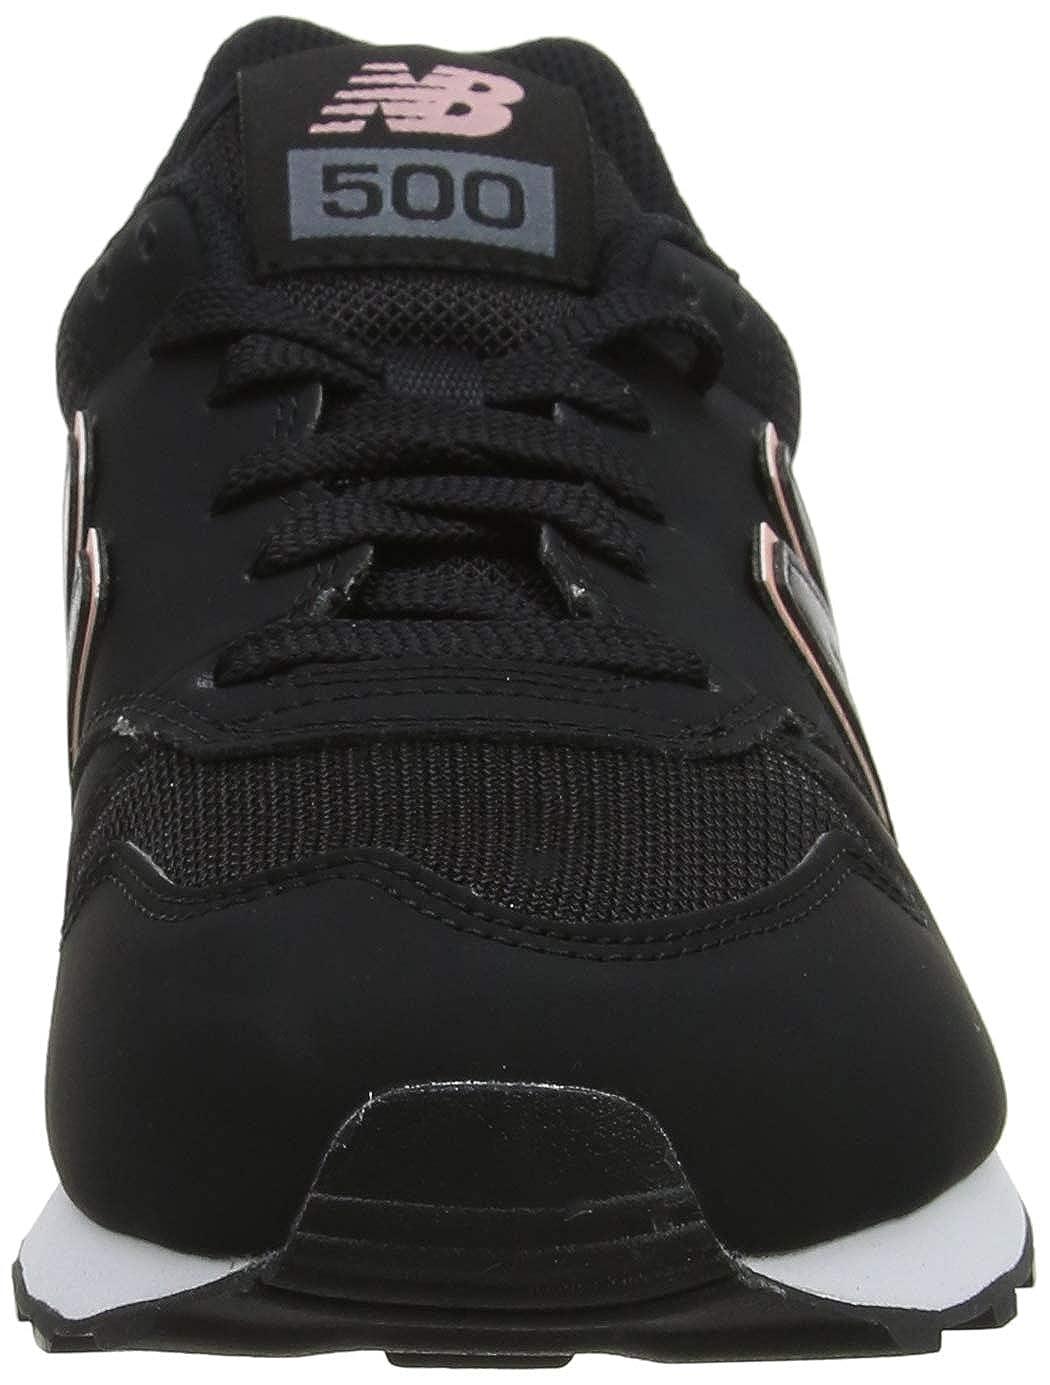 New Balance Women/'s 500 Trainers